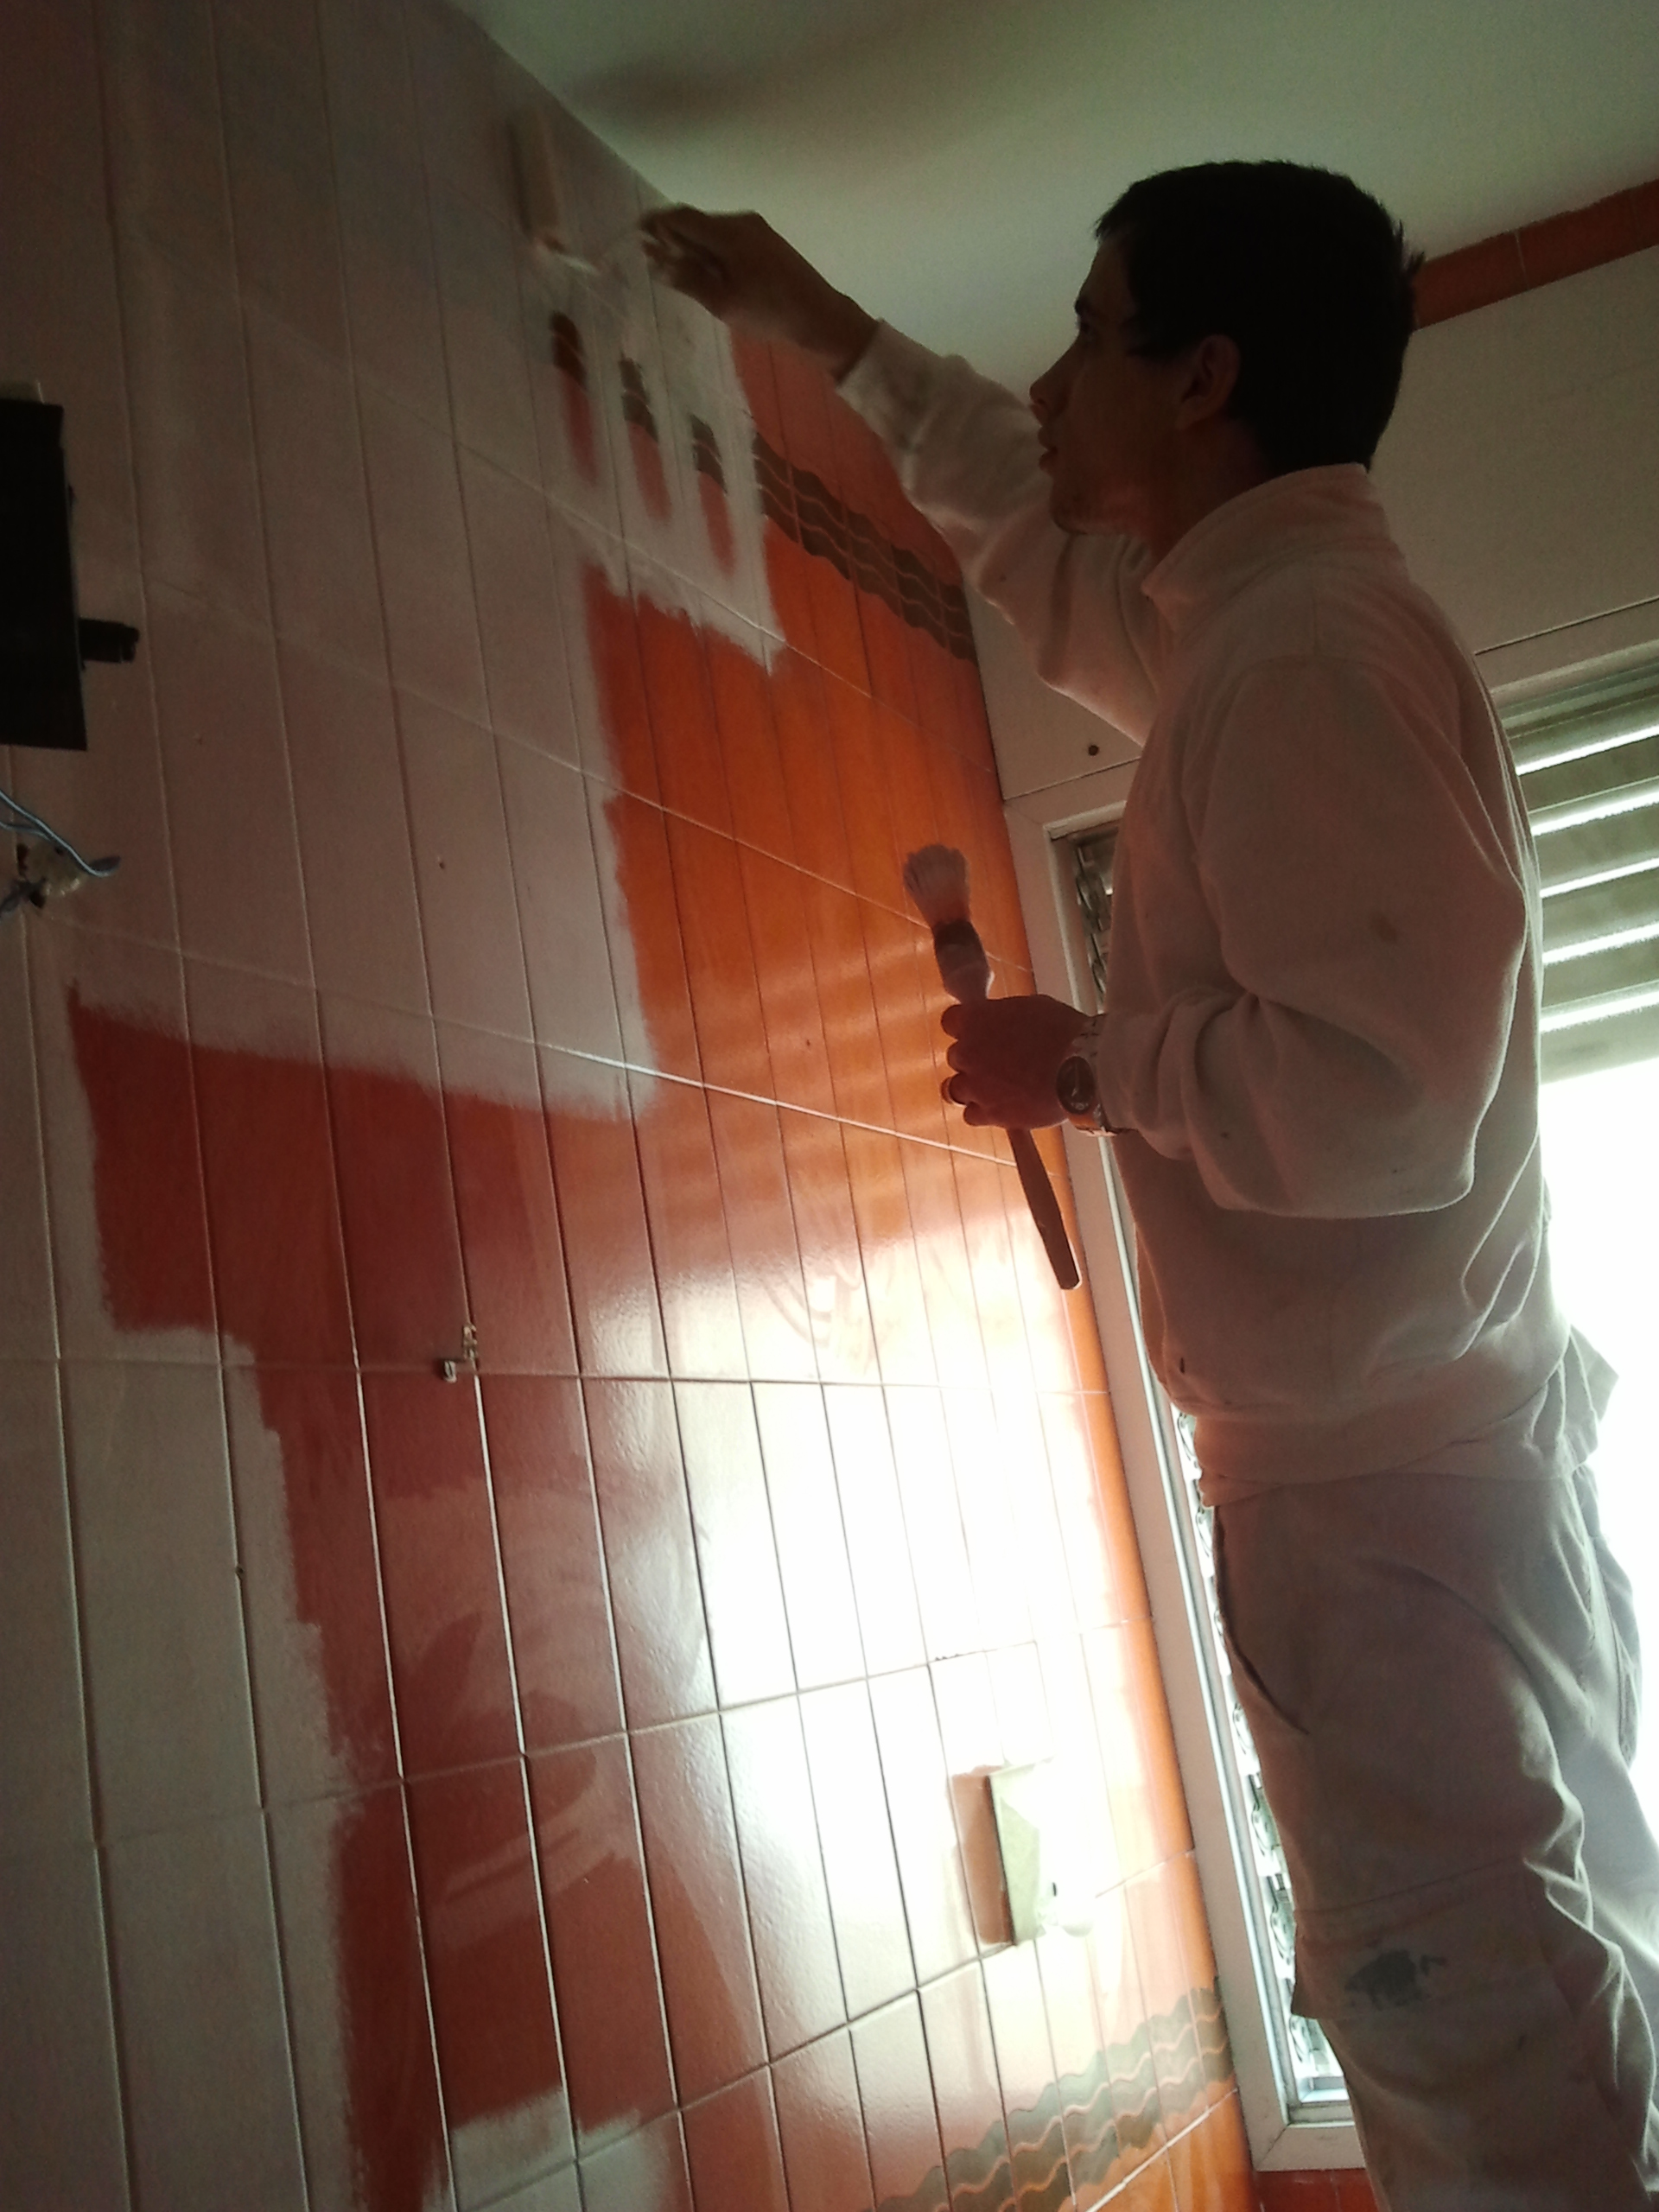 Click more images - Donde comprar pintura para azulejos ...